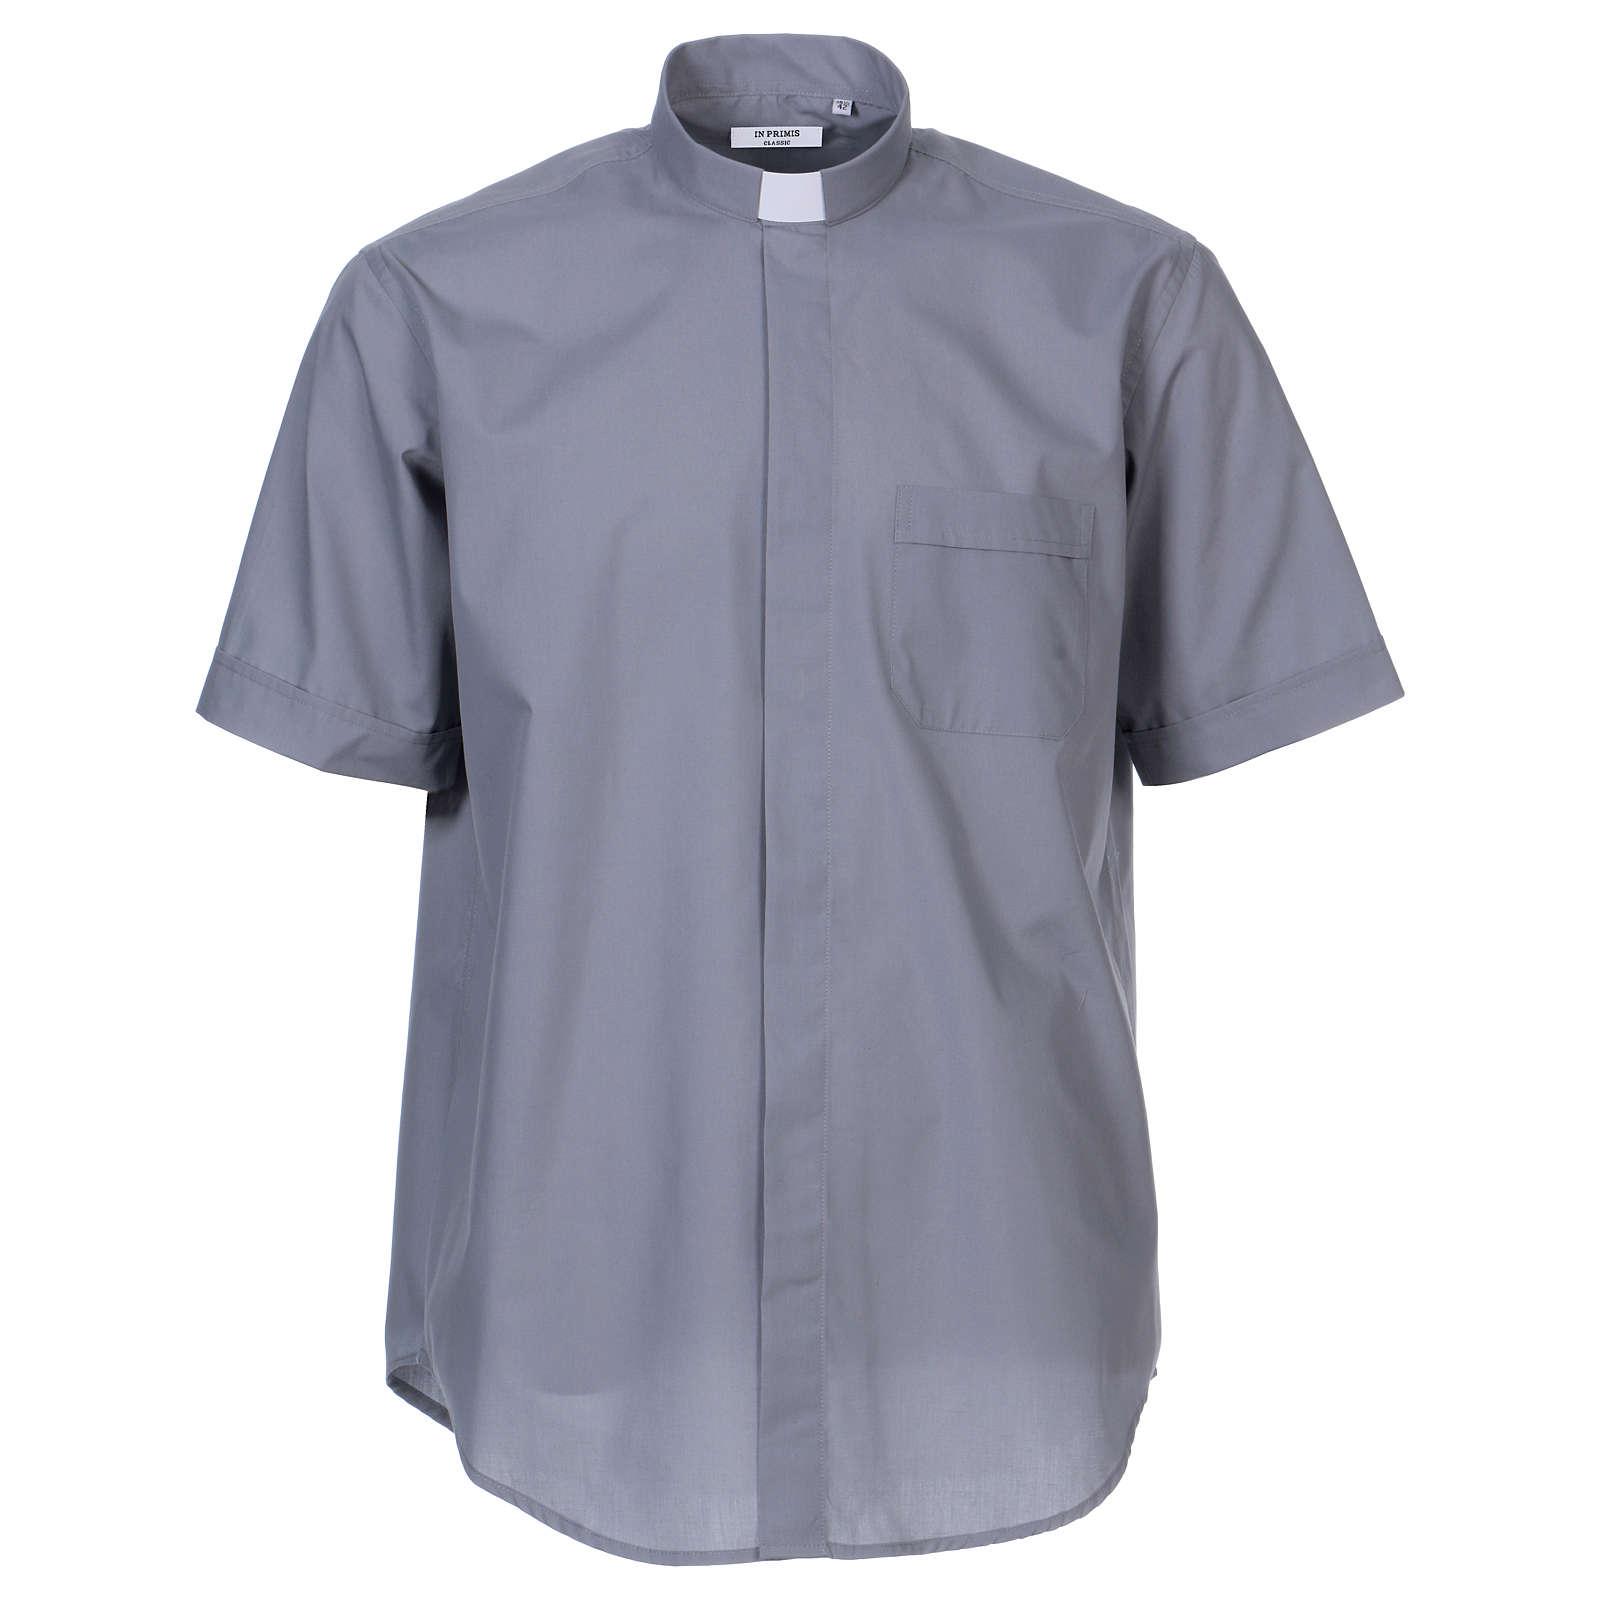 Camisa clergyman manga corta mixto algodón gris claro 4